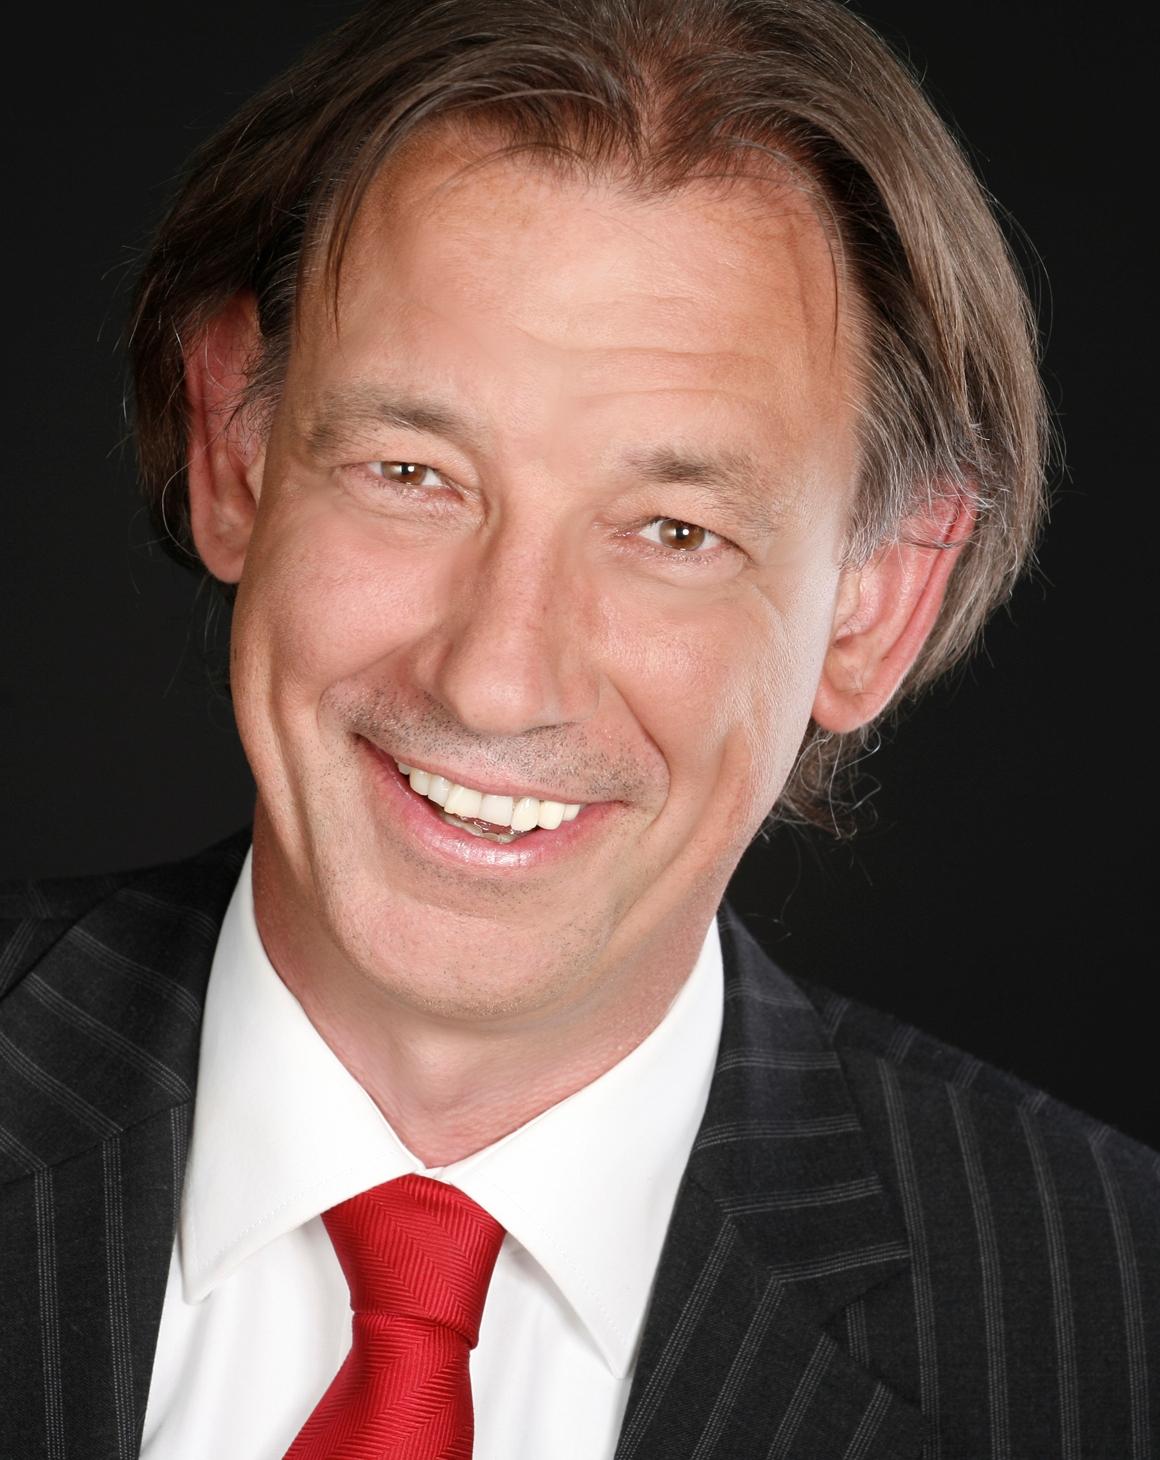 Peter H. Buchenau / Burnout-Zentrum e.V.